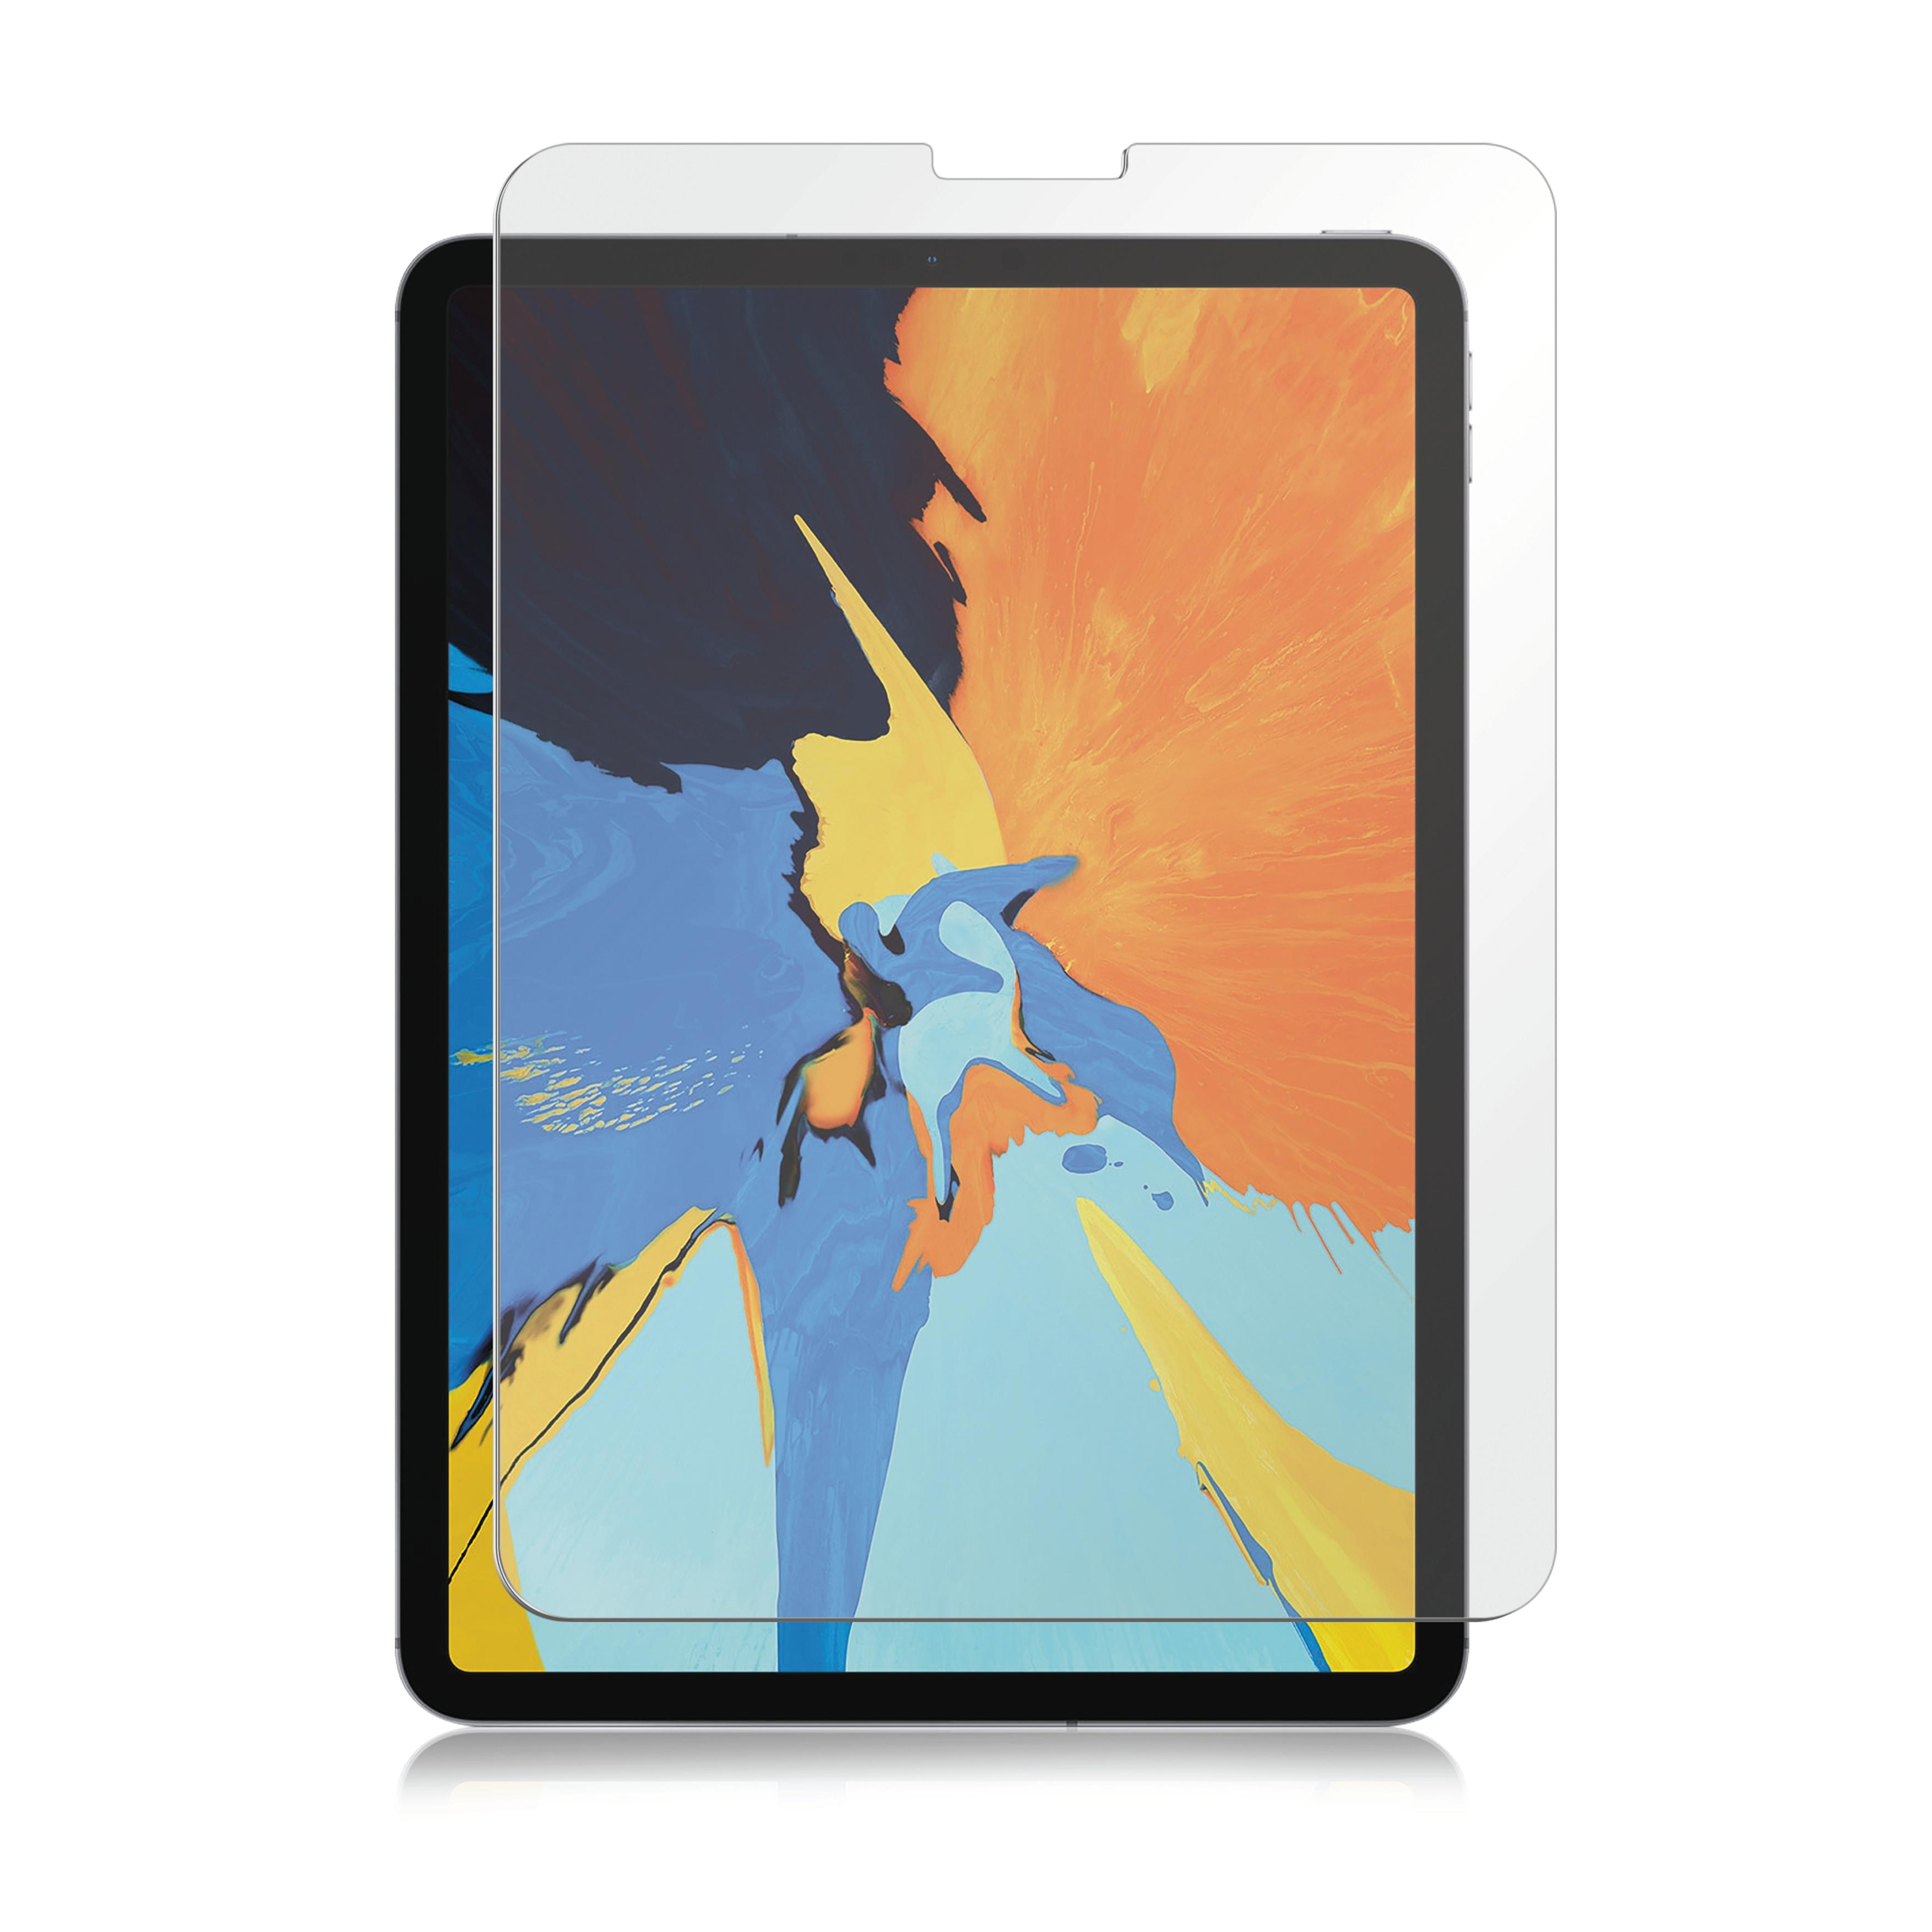 Tempered Glass iPad Pro 12.9 2018/2020/2021